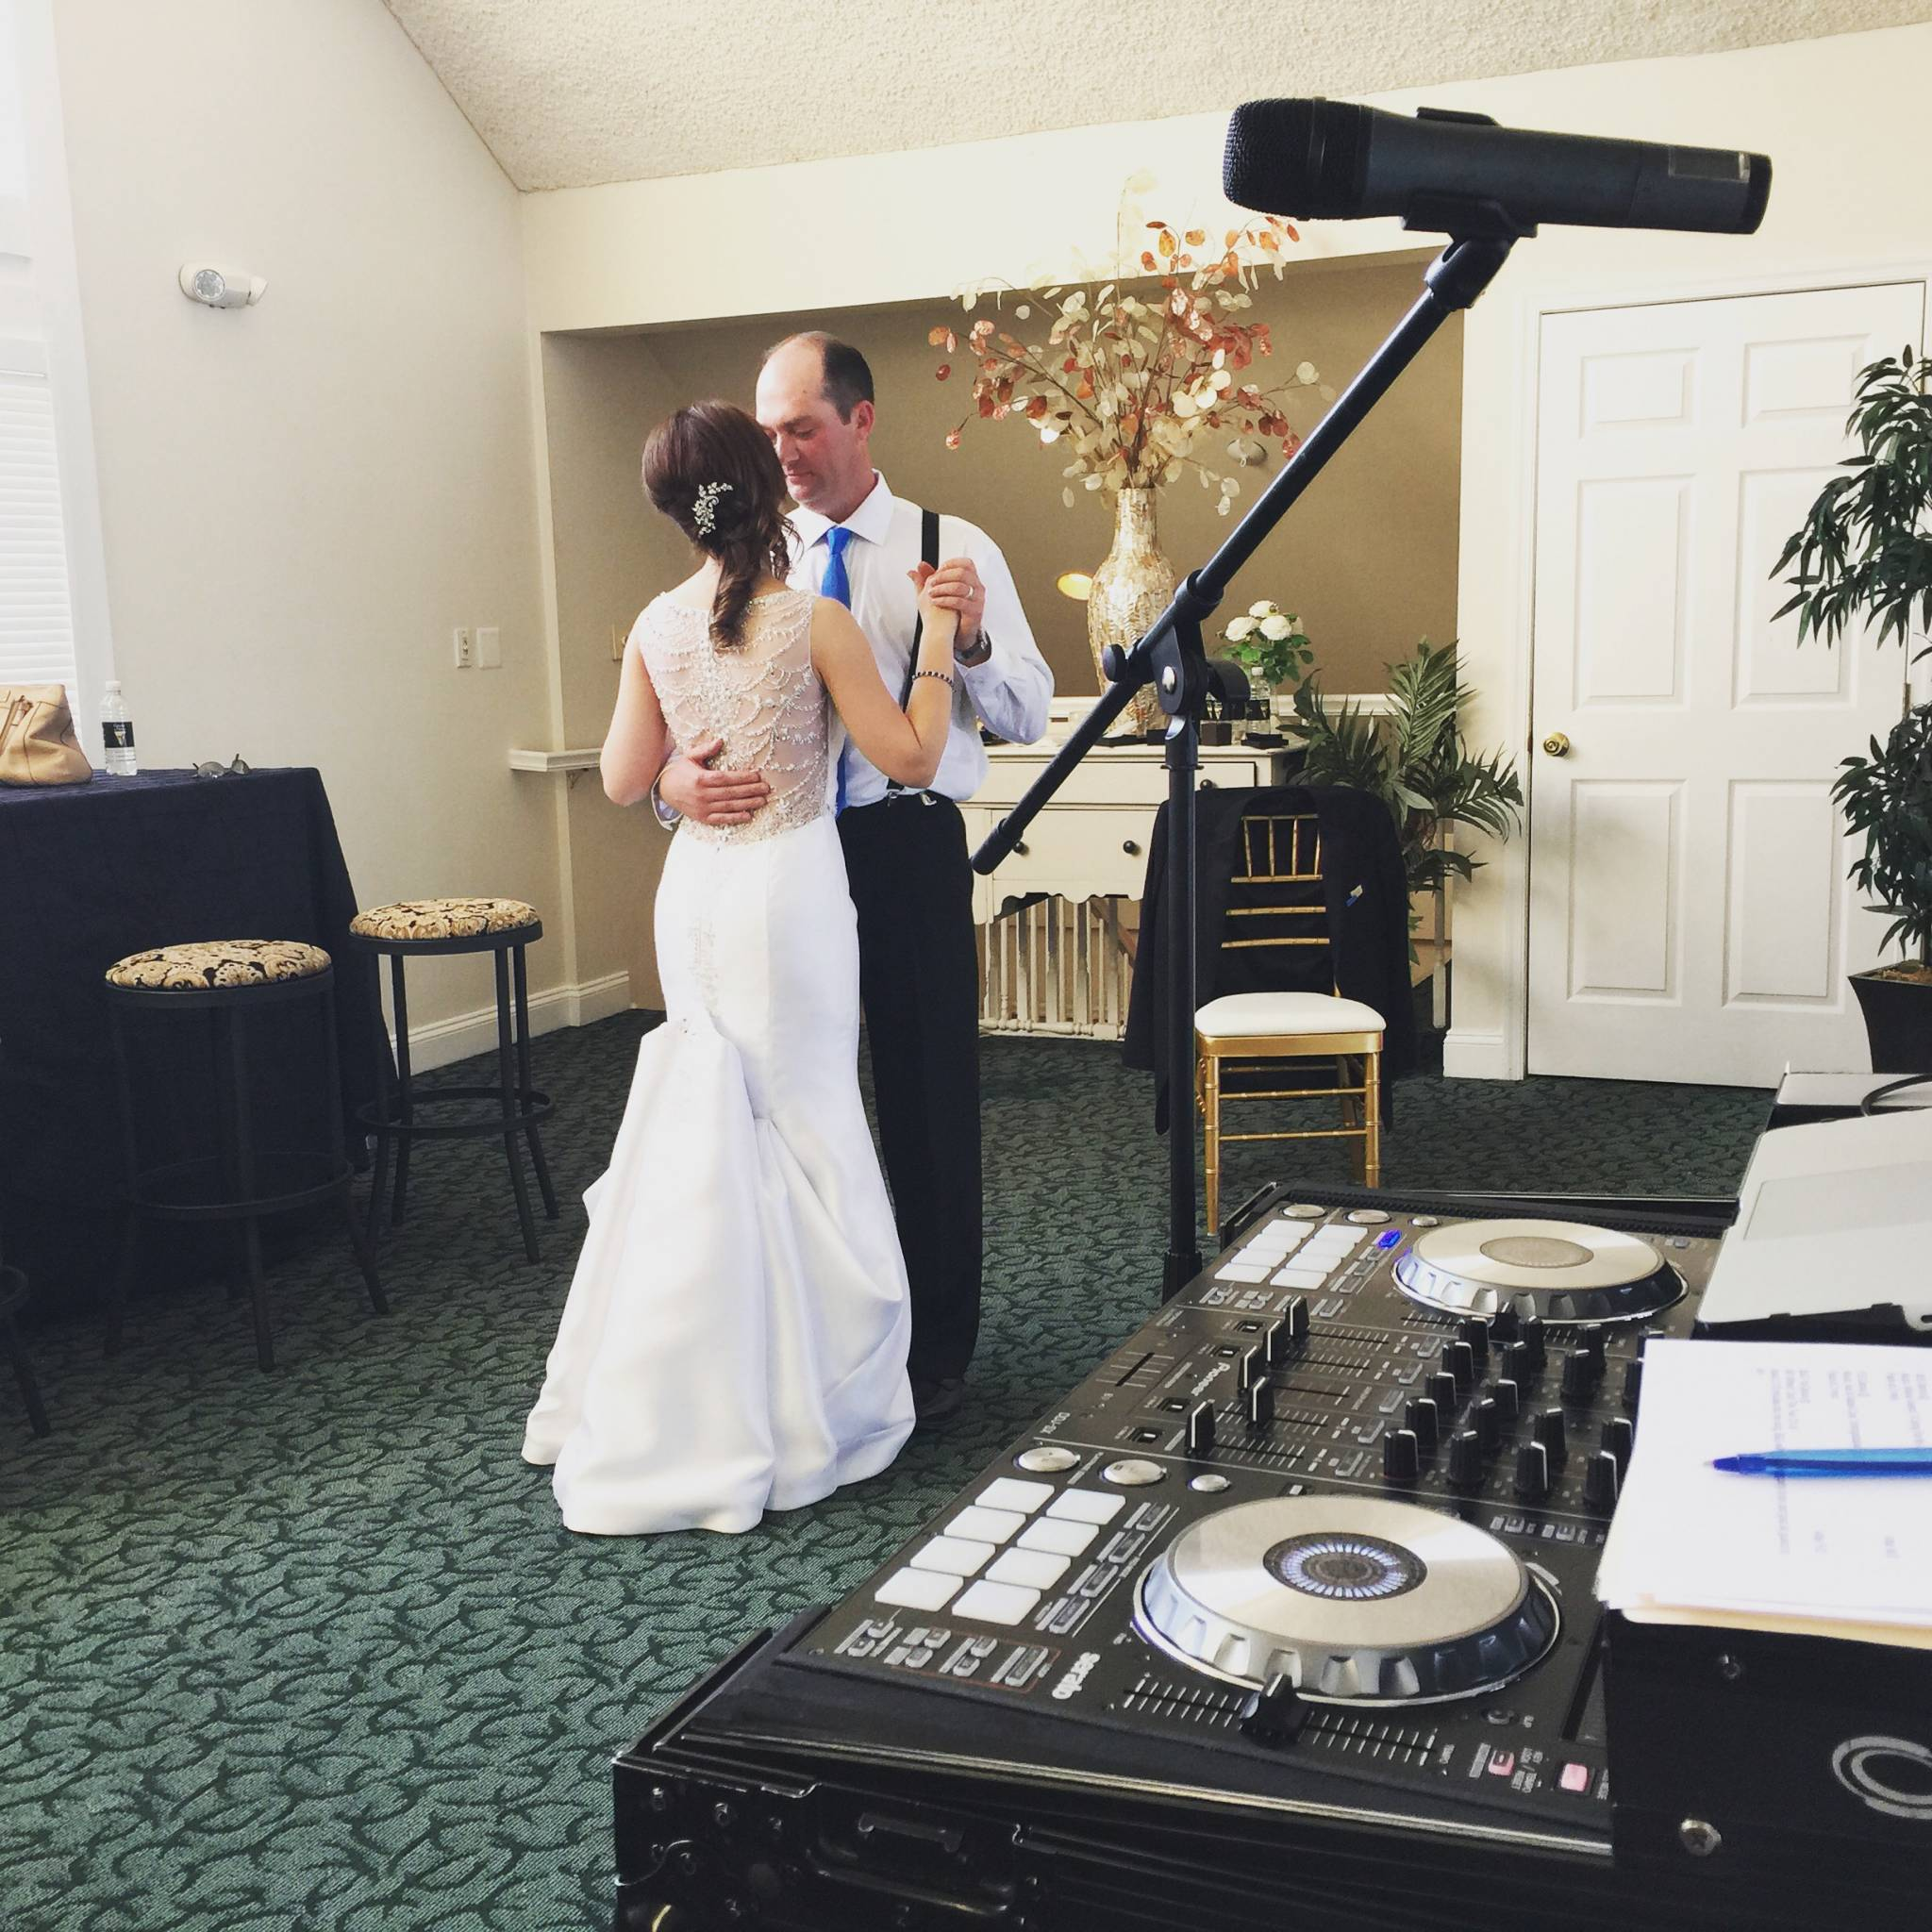 Amanda & Bryan's Wedding + Reception at Celebrations at the